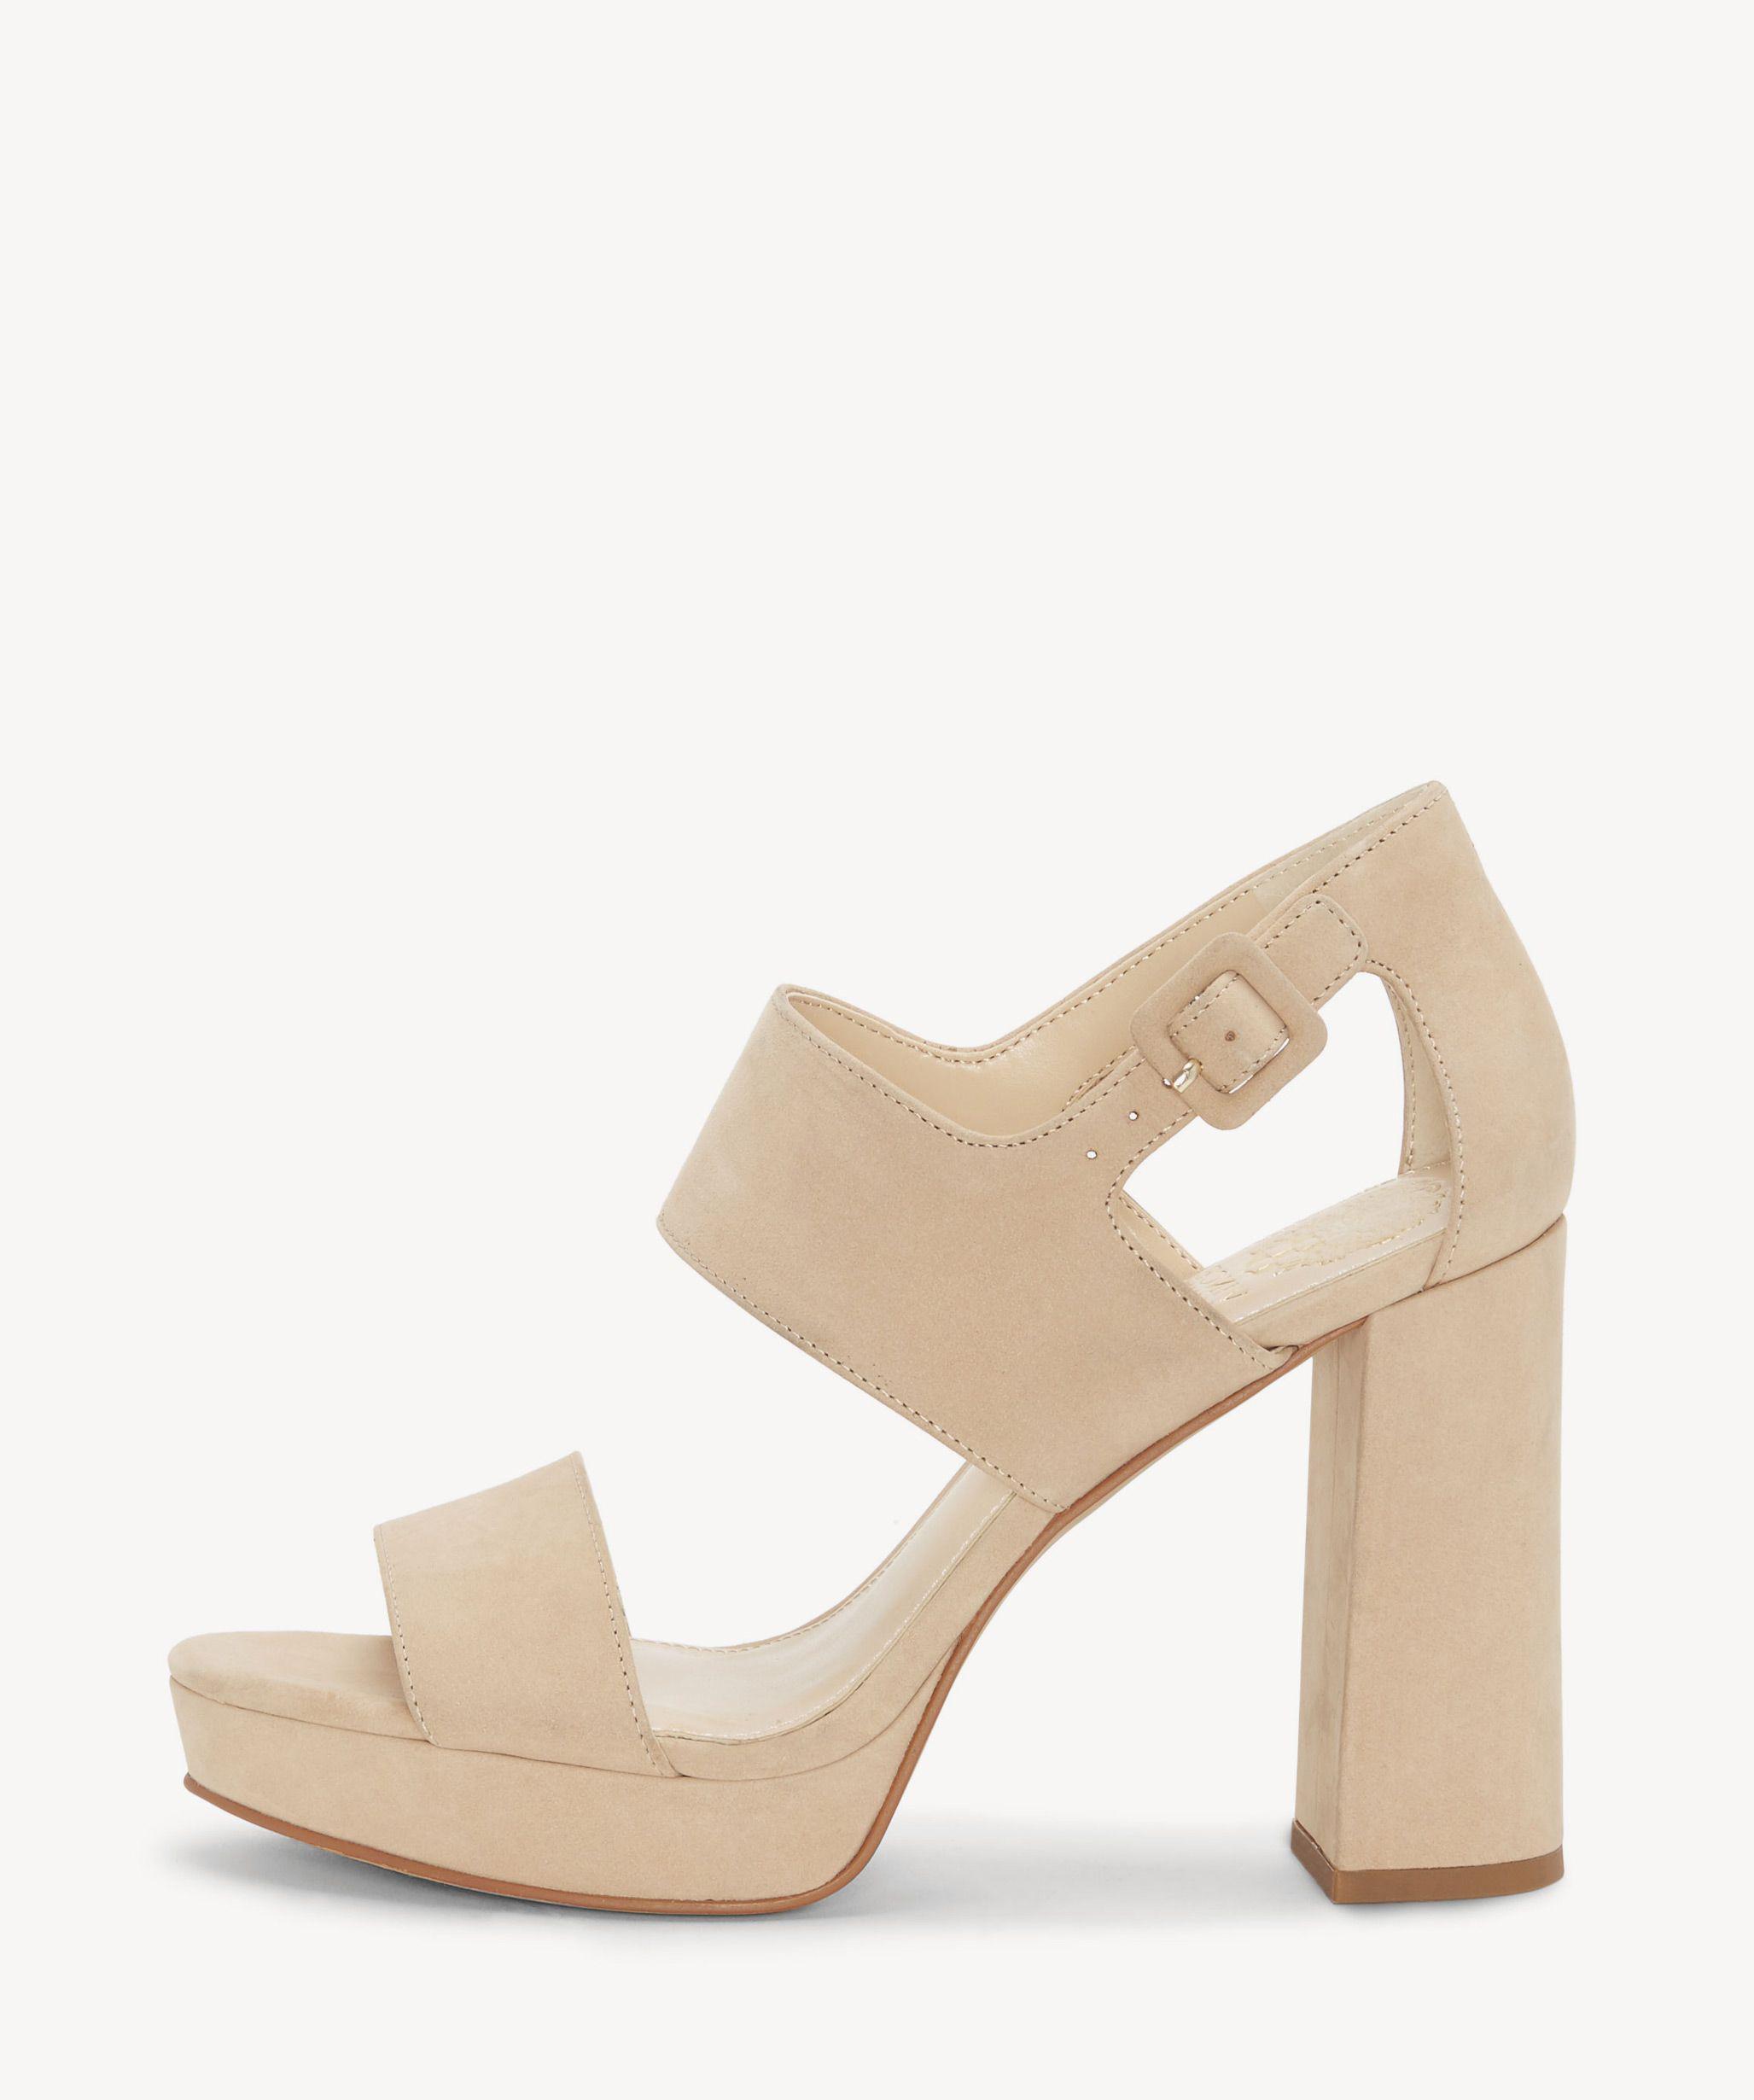 66051898b03 Lyst - Vince Camuto Jayvid Block Heel Sandal in Natural